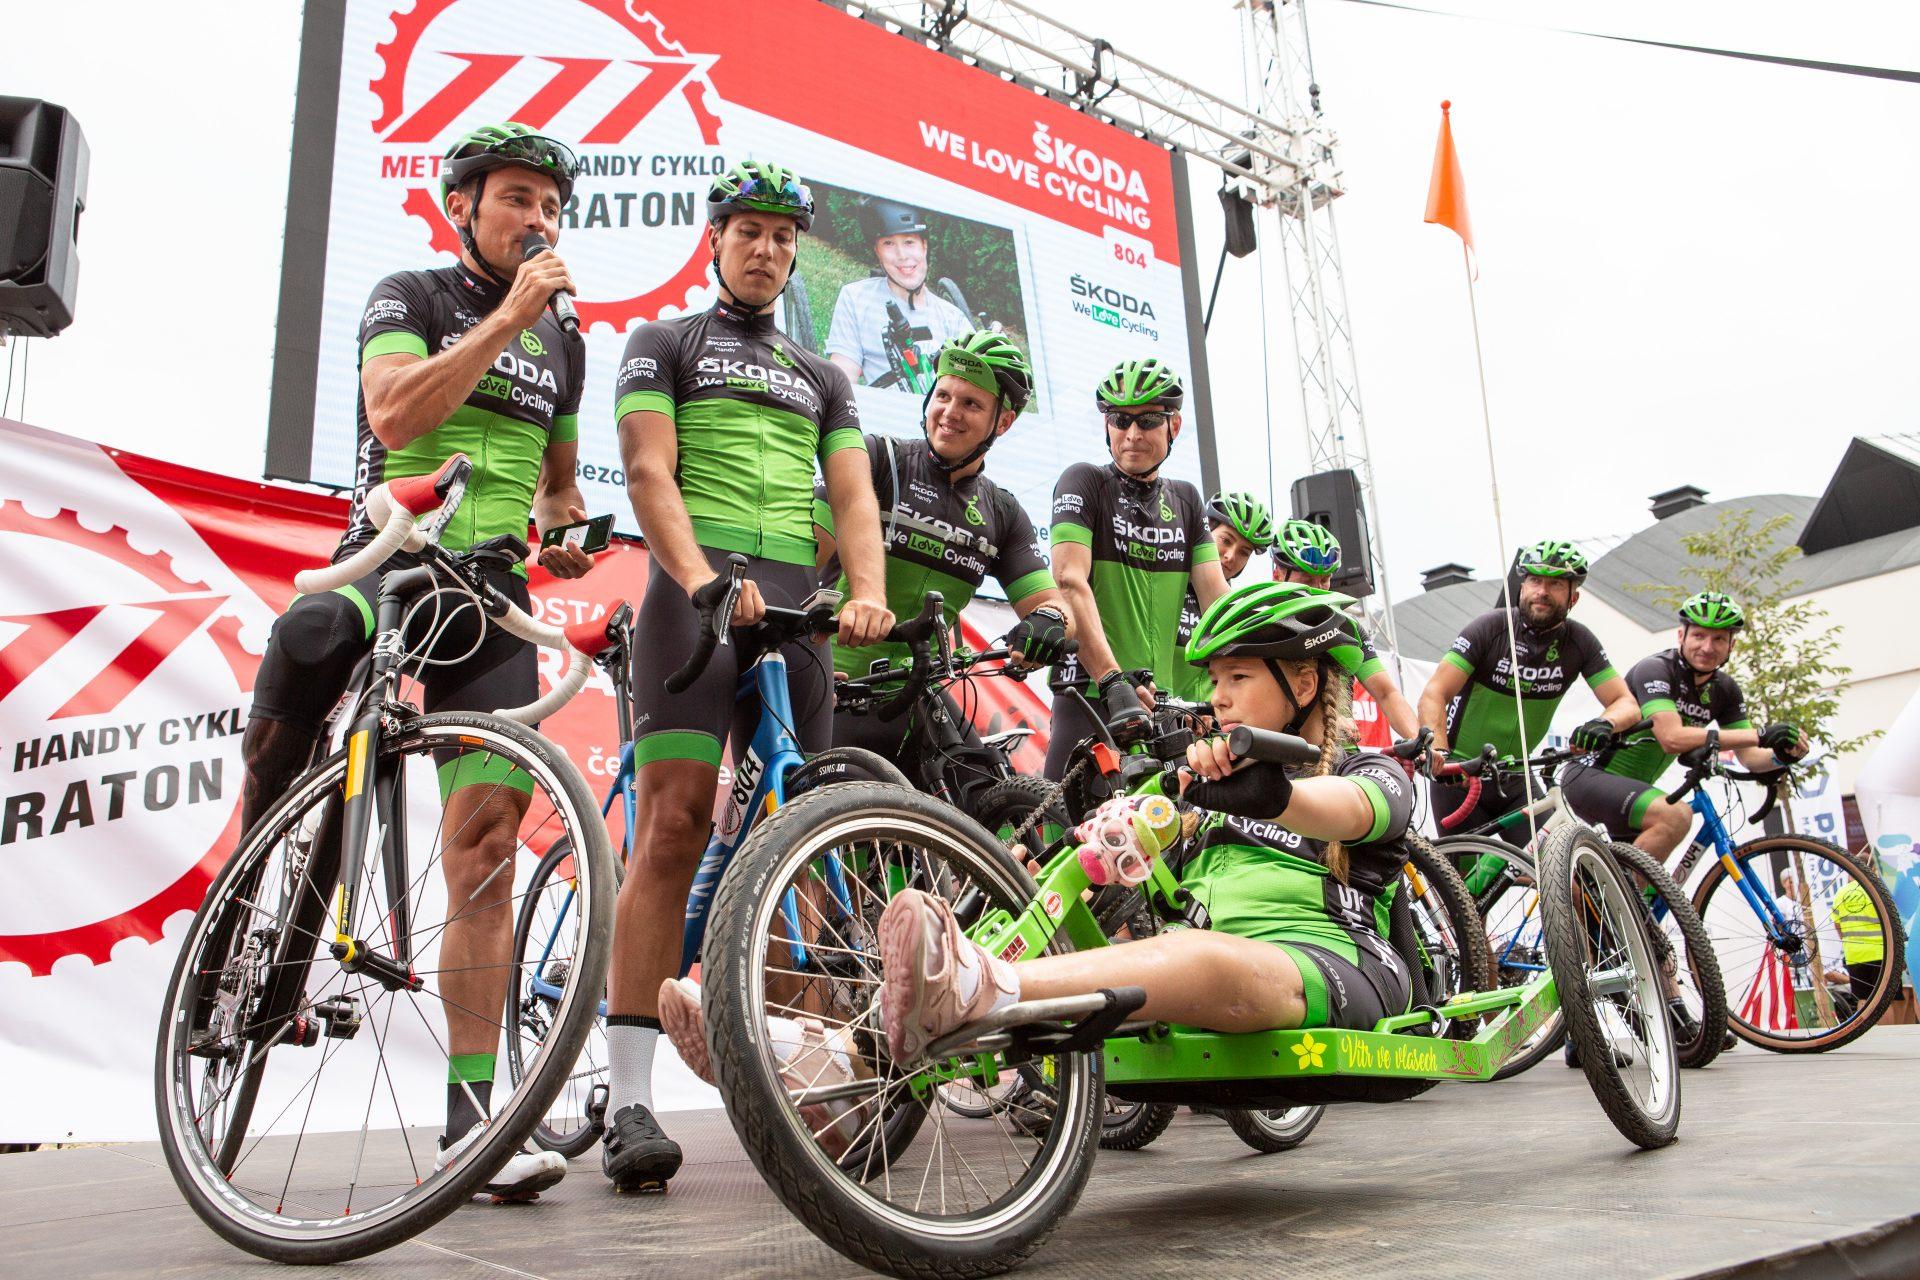 Tým We Love Cycling na startu loňského ročníku Metrostava Handy Cyklomaratonu.